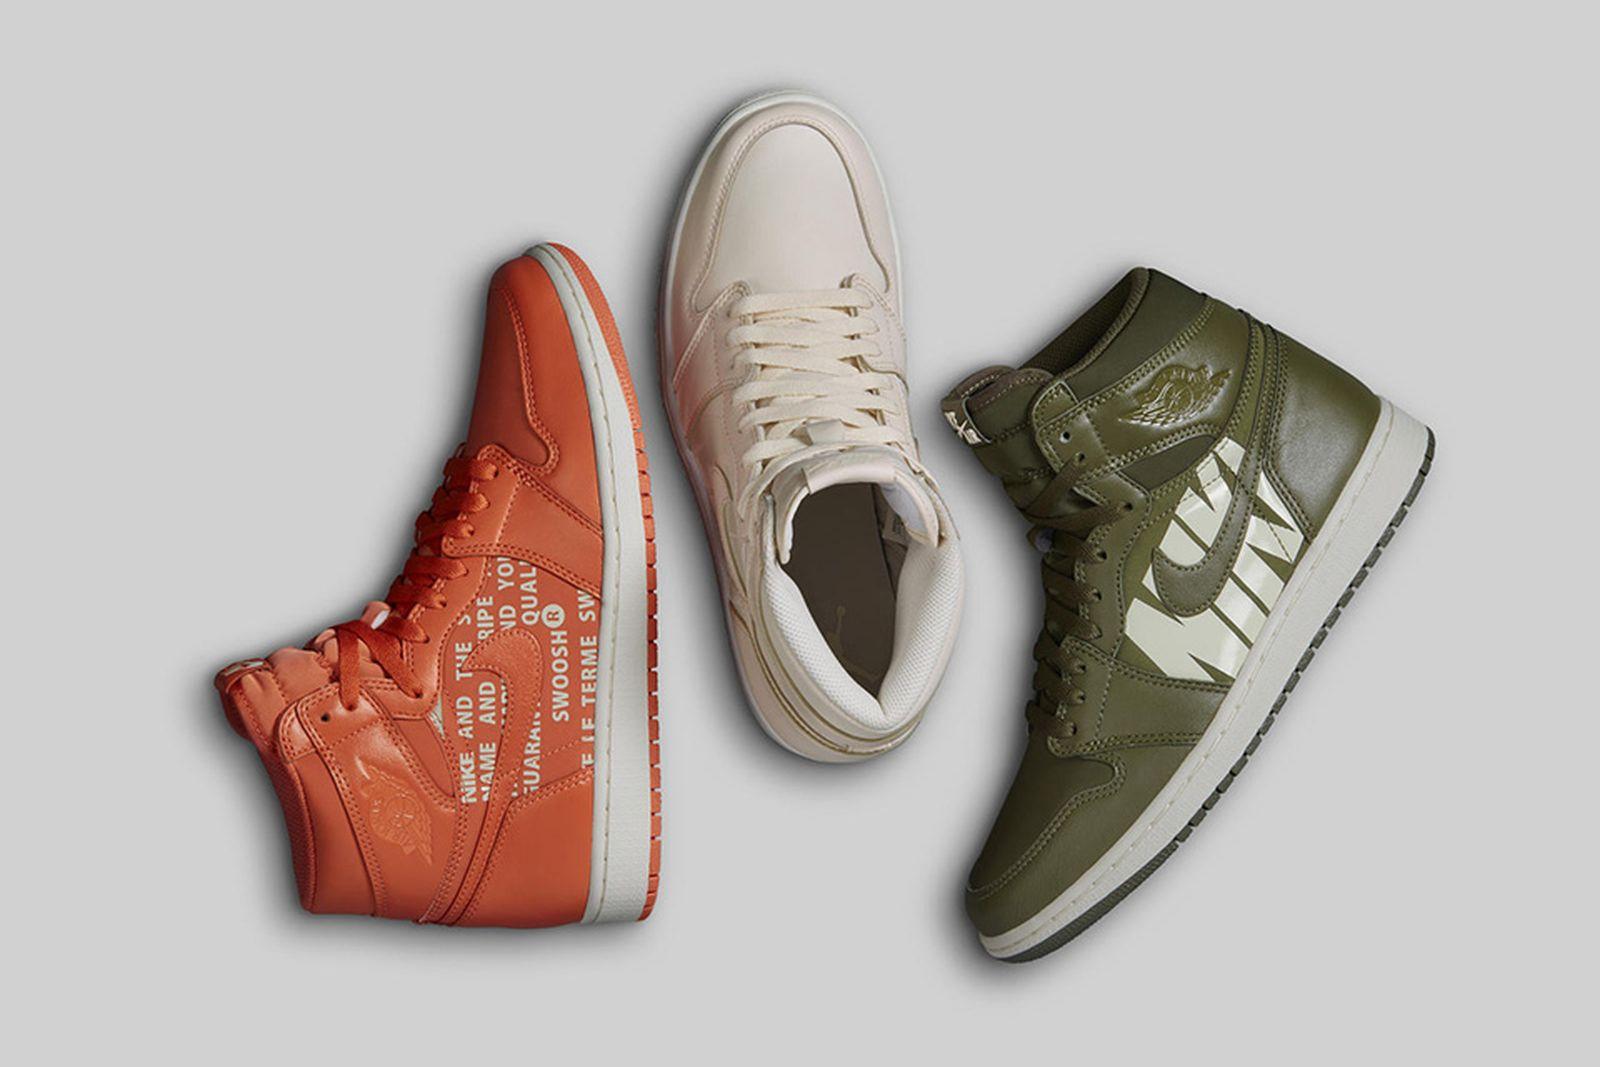 air jordan 1 collection ss18 Nike jordan brand